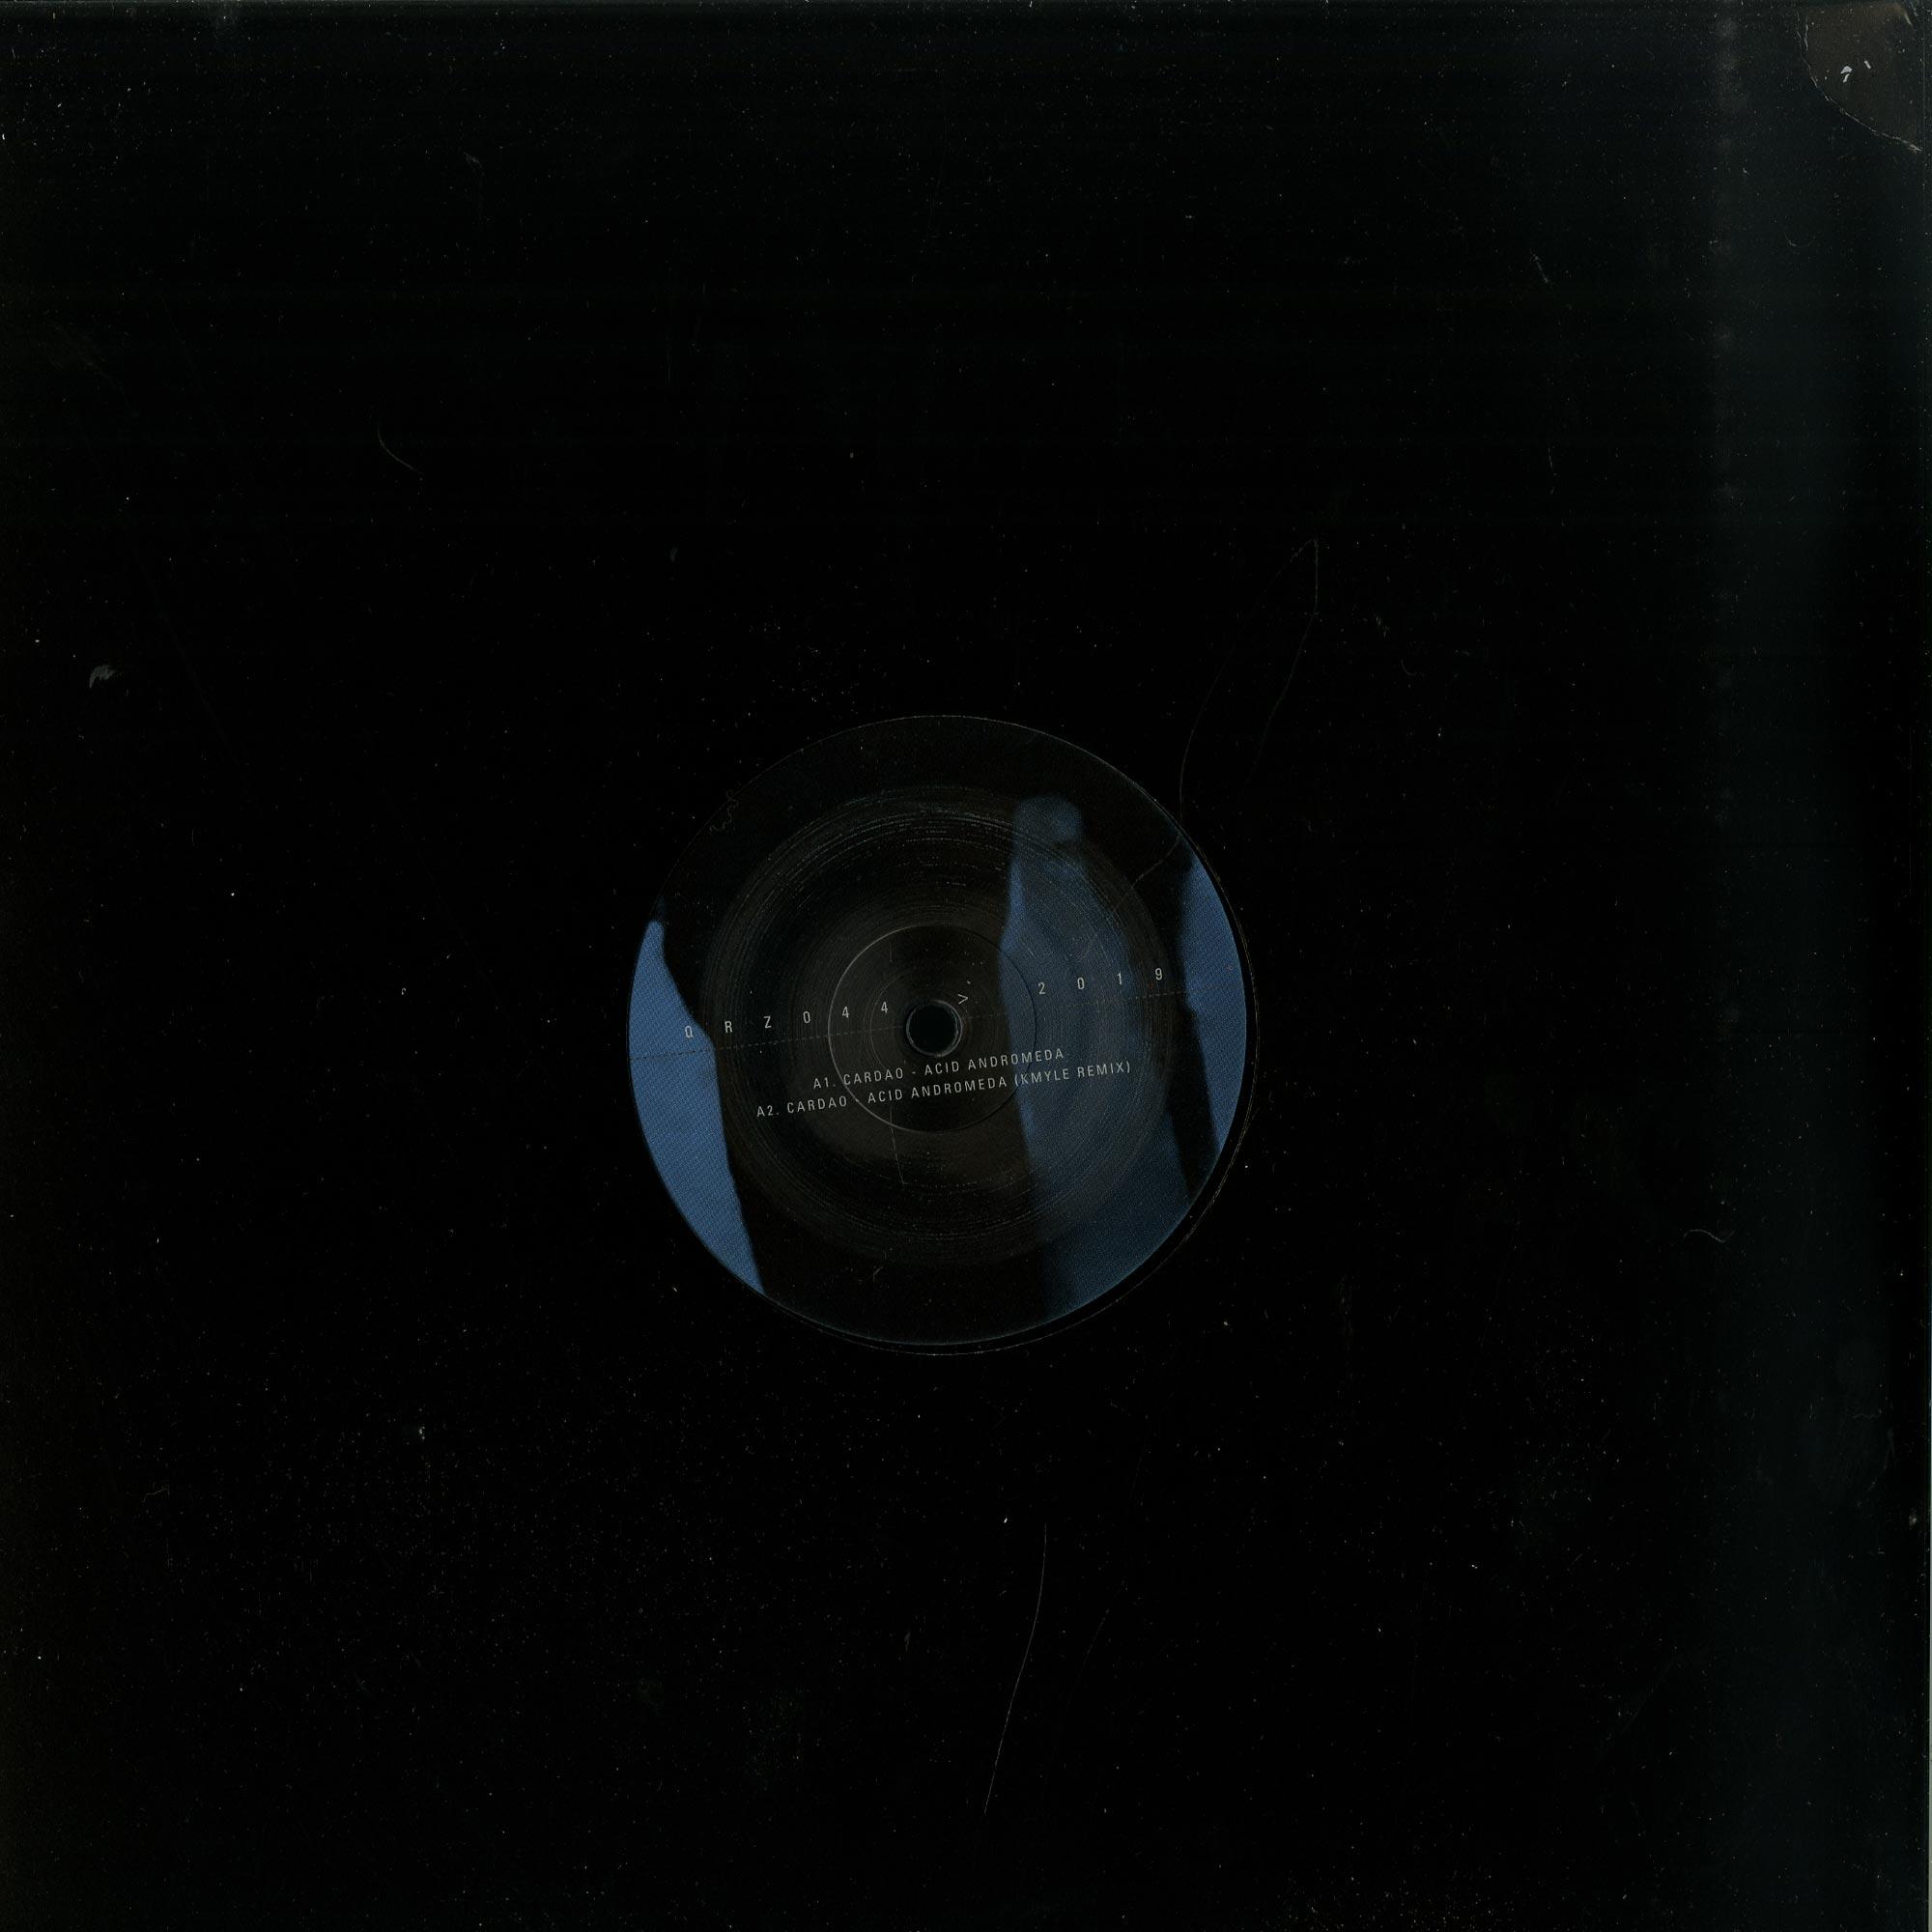 Cardao / Paul Ritch - ACID ANDROMEDA